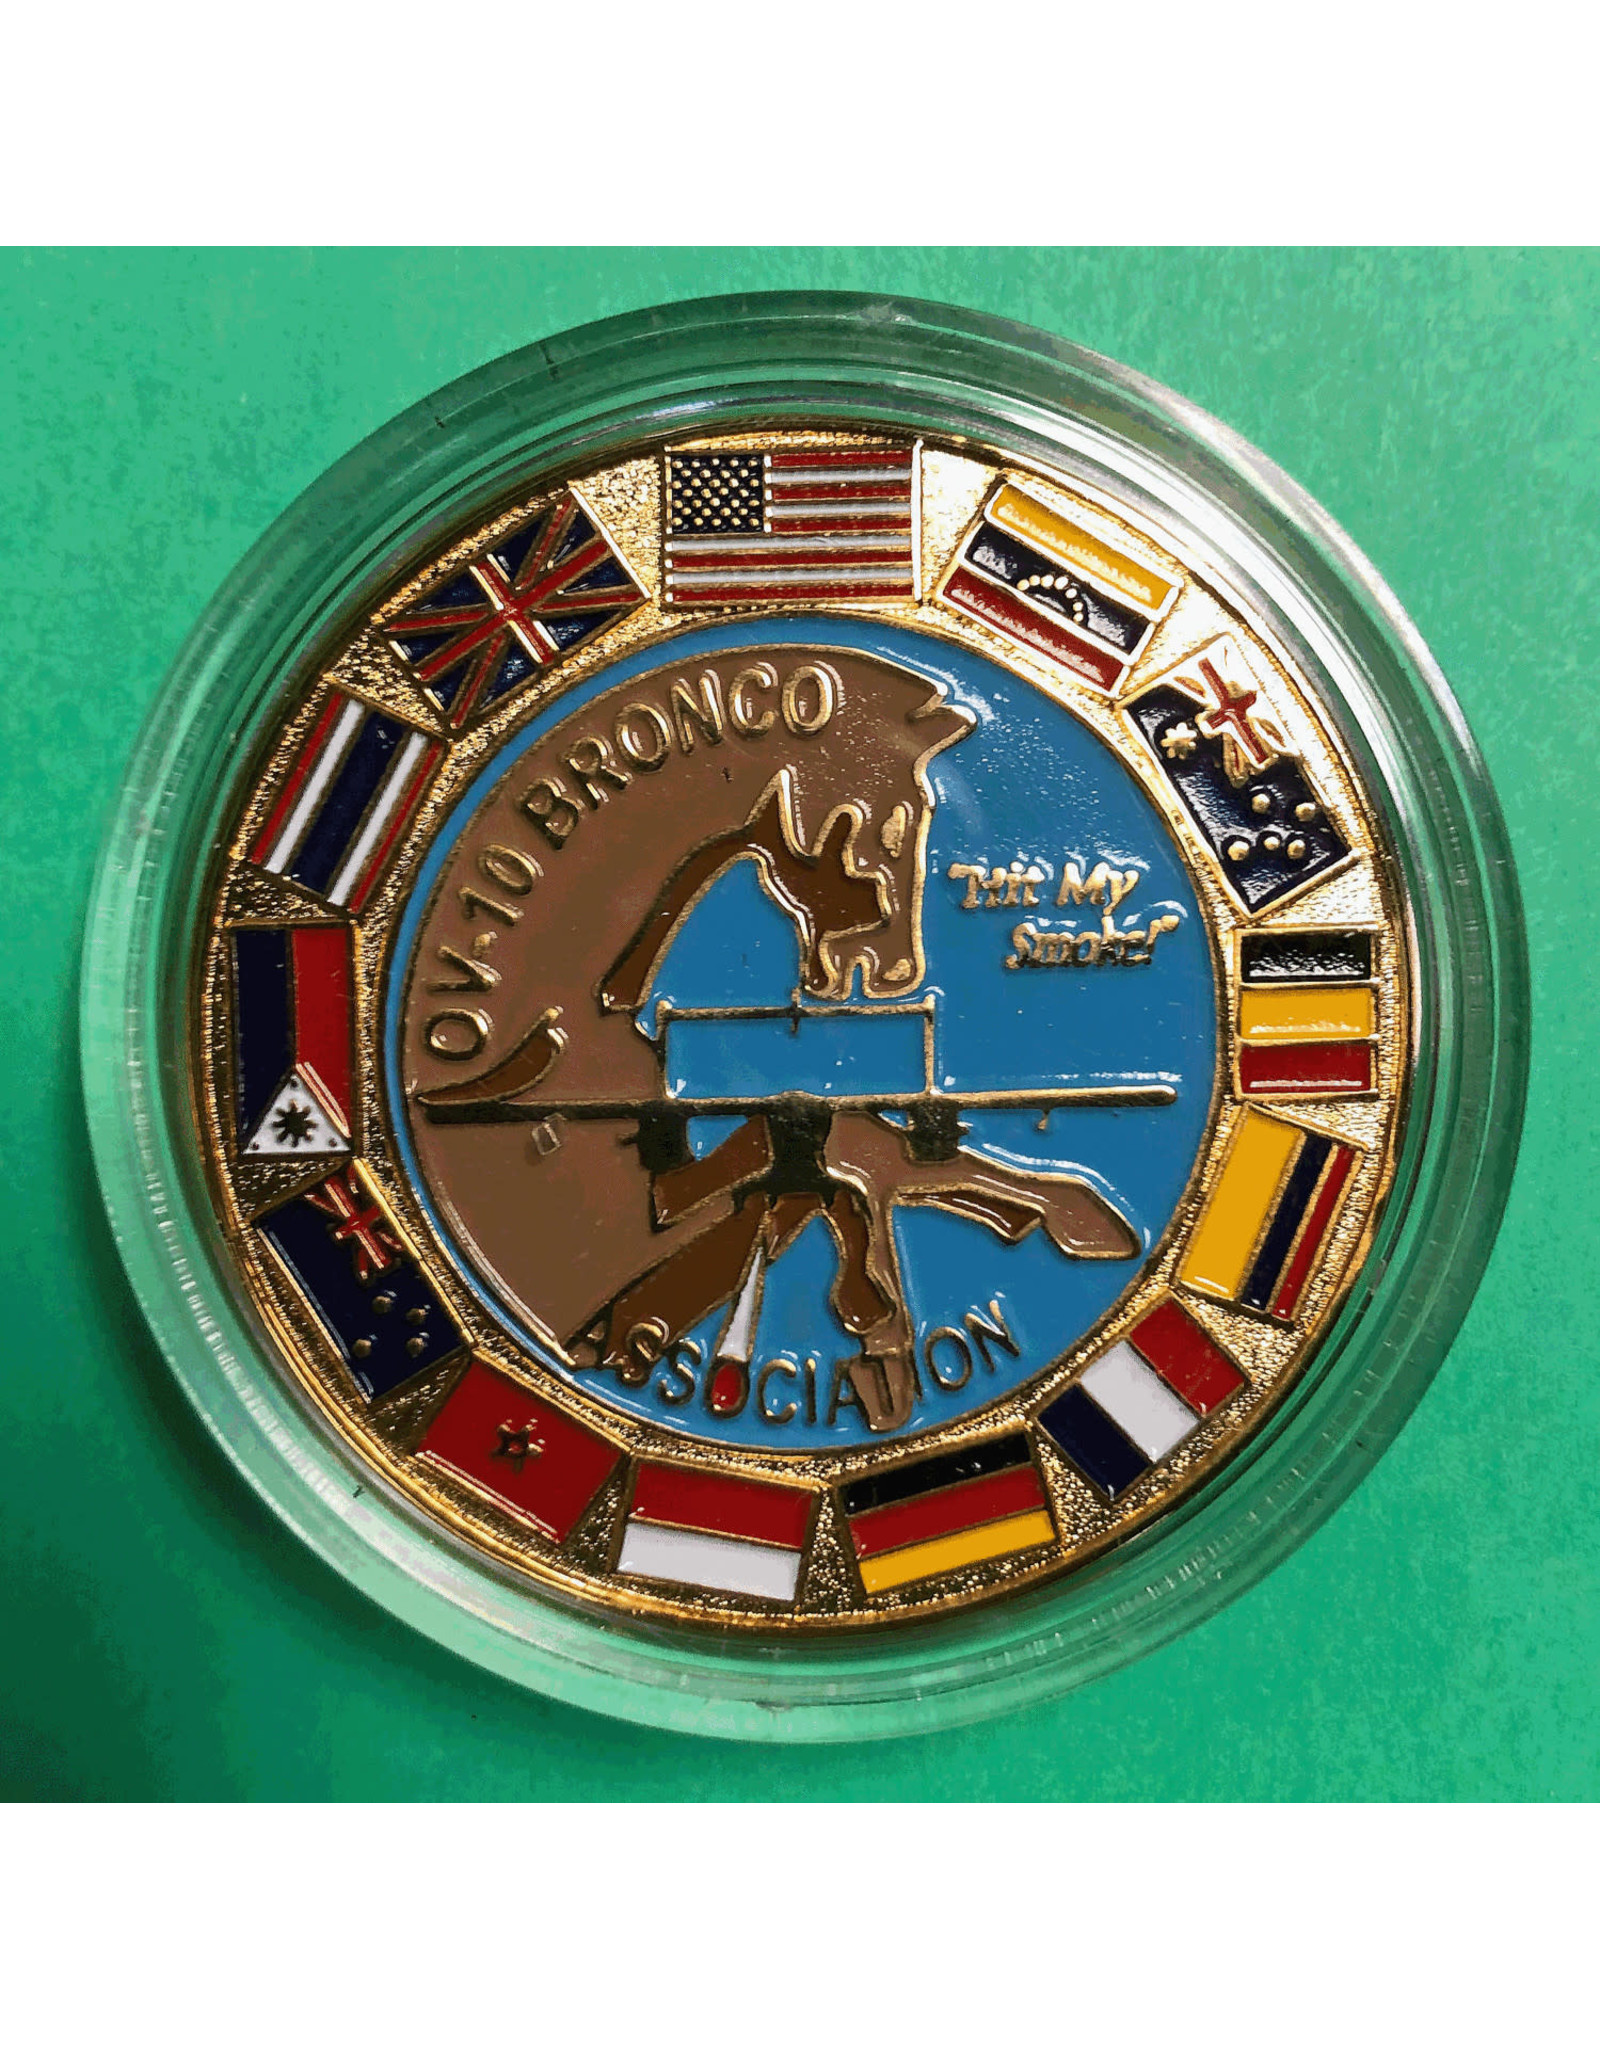 OV-10 Bronco Association Flags Coin